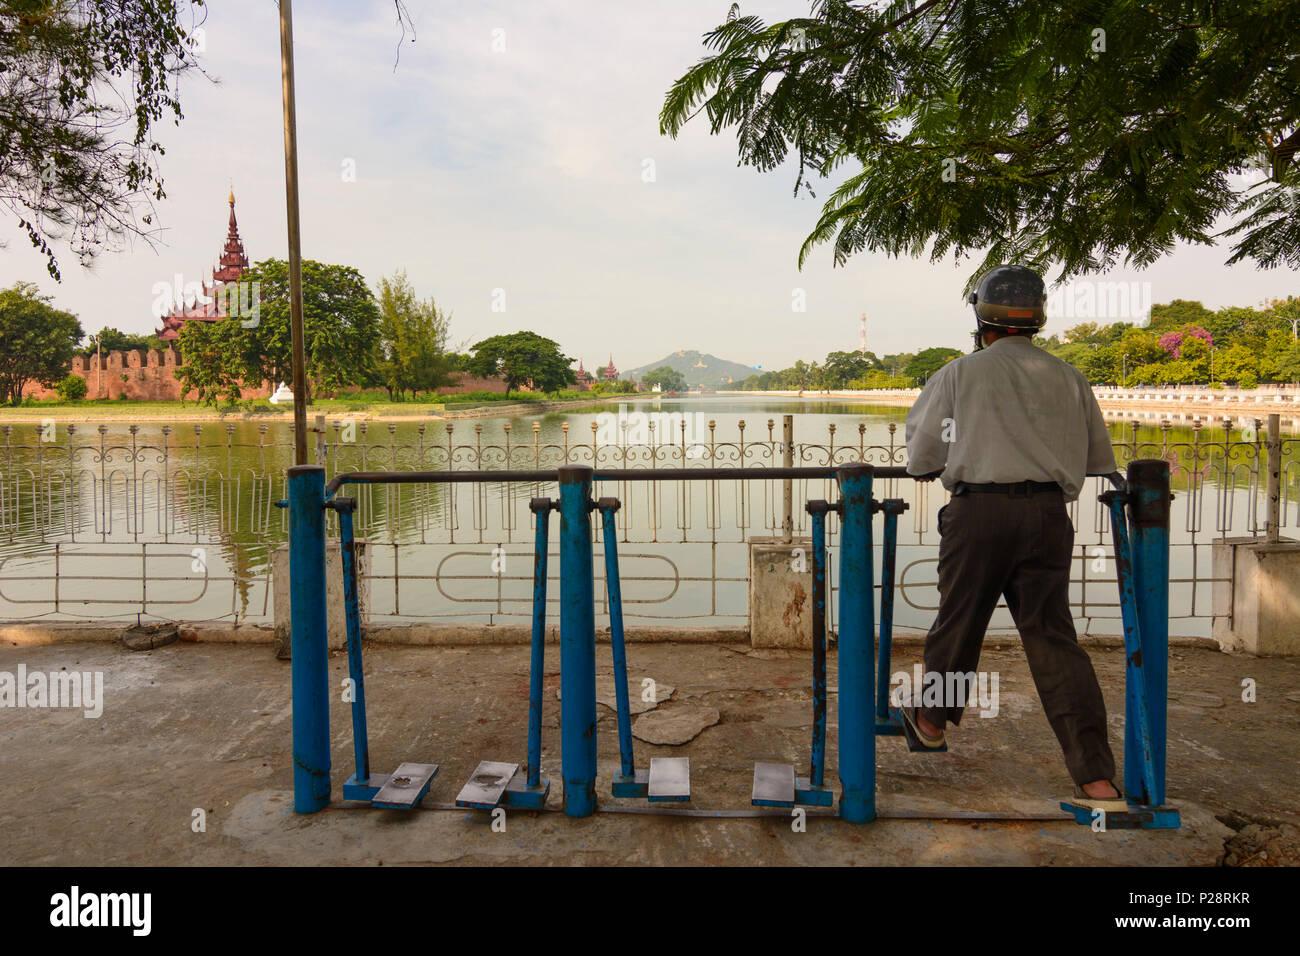 Palais de Mandalay Mandalay, rempli d'eau, douves, bastion, Mandalay Hill, machine d'exercice, Région de Mandalay, Myanmar (Birmanie) Photo Stock